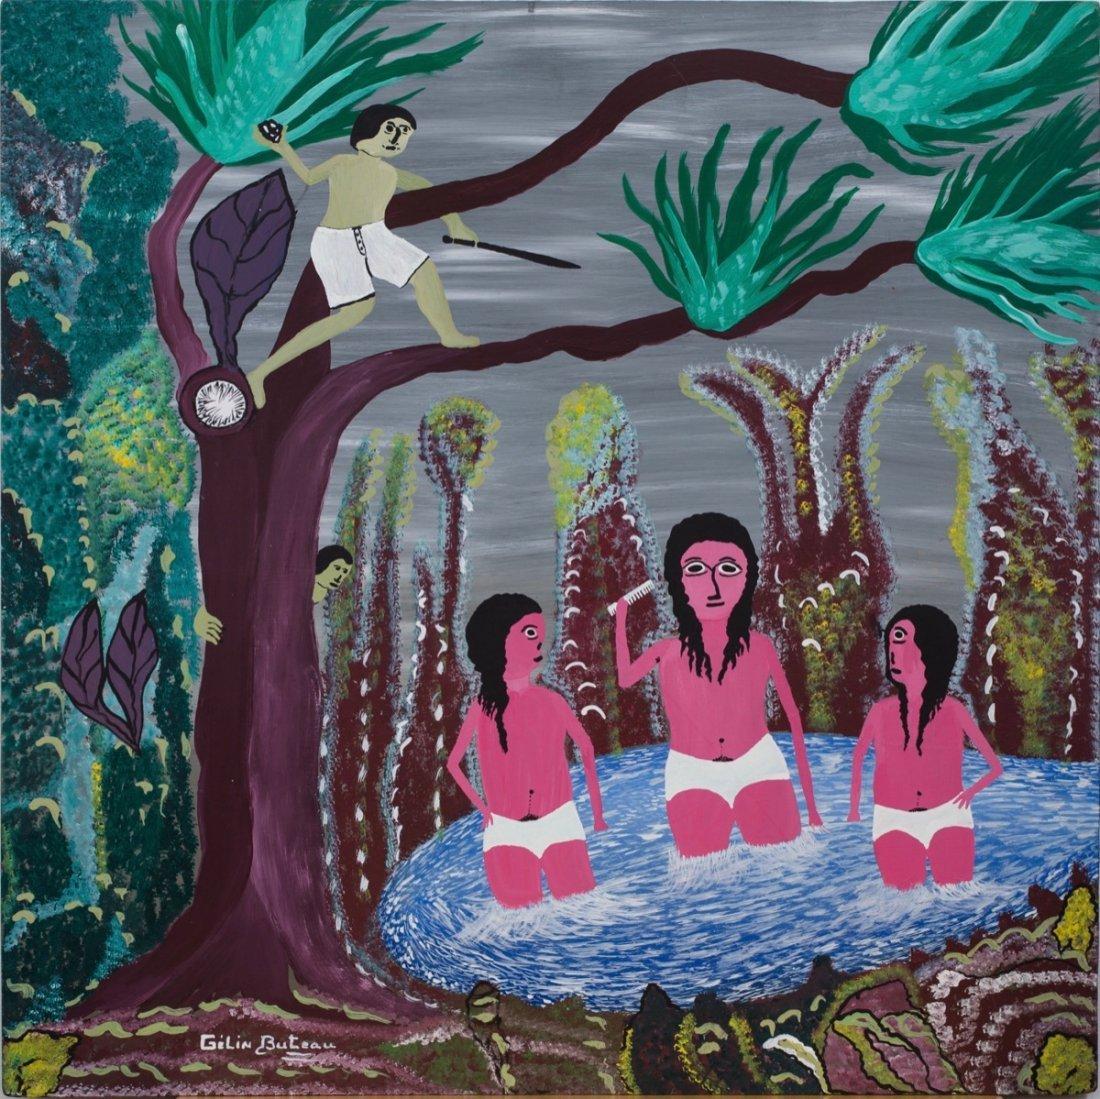 Gelin Buteau (Haitian/Village of Coteau, 1954-2000)